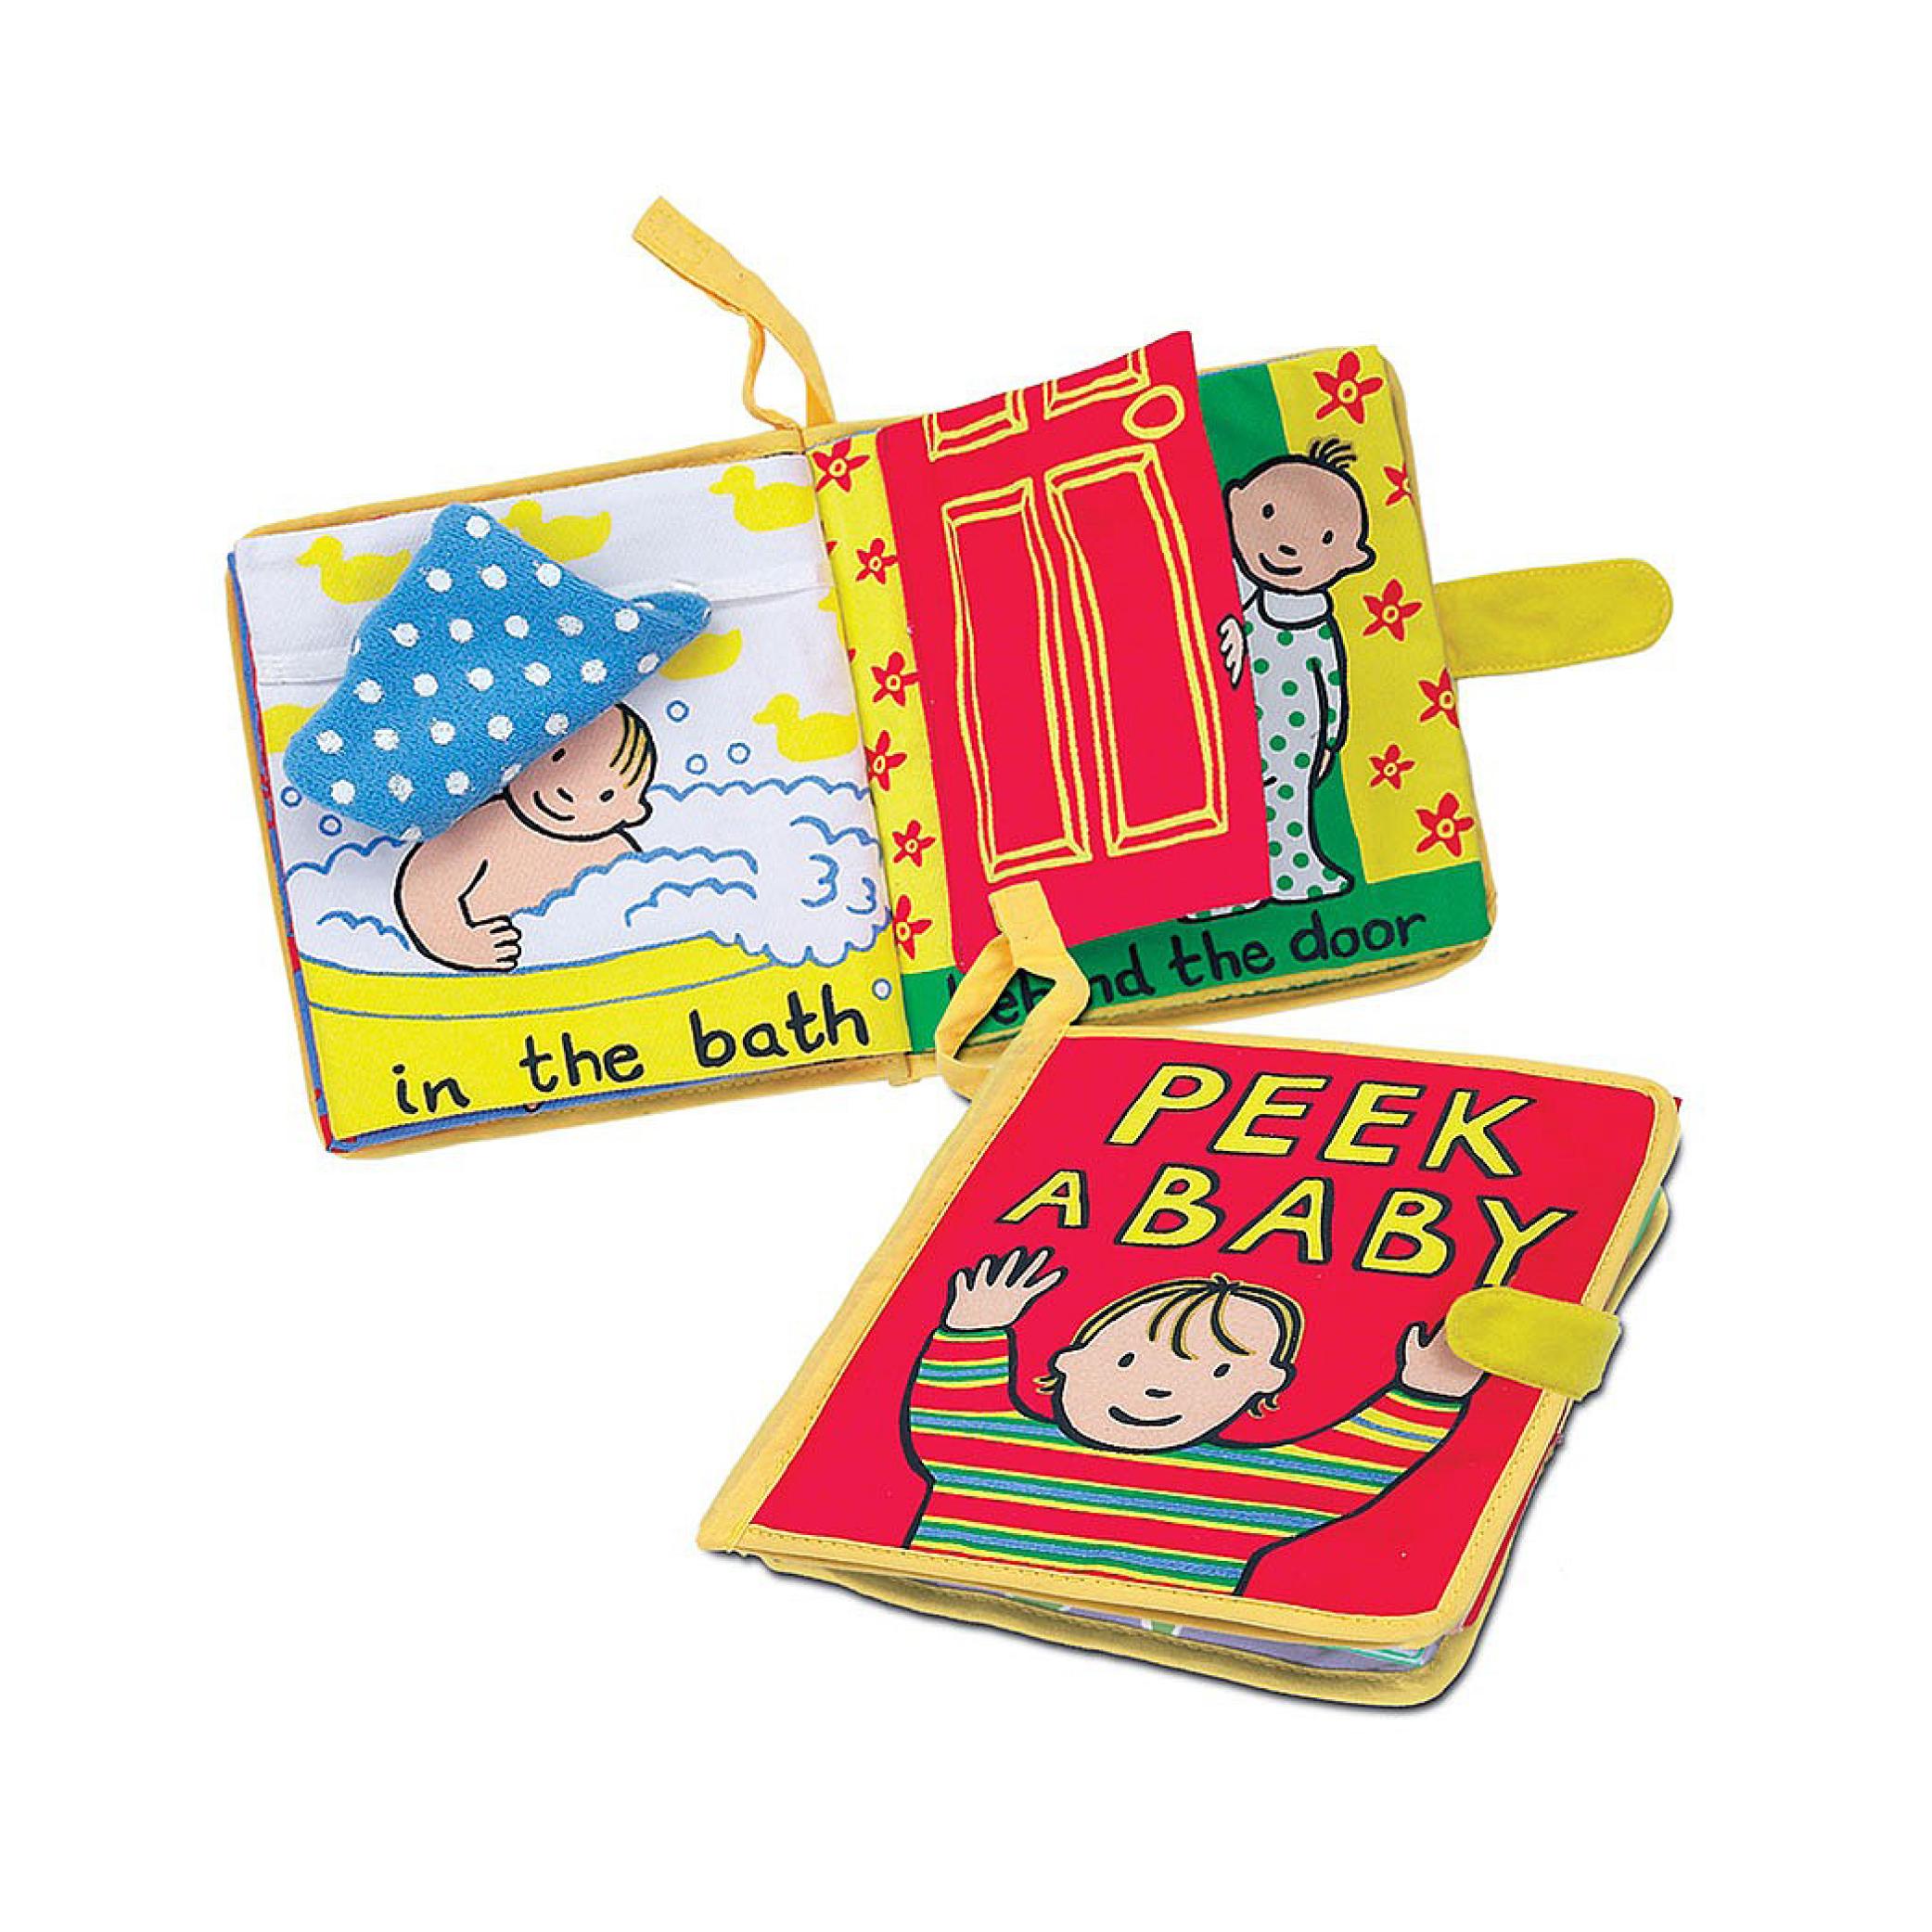 Peek a Baby Soft Book $13.75   Wants 1 Has 0 Needs 1